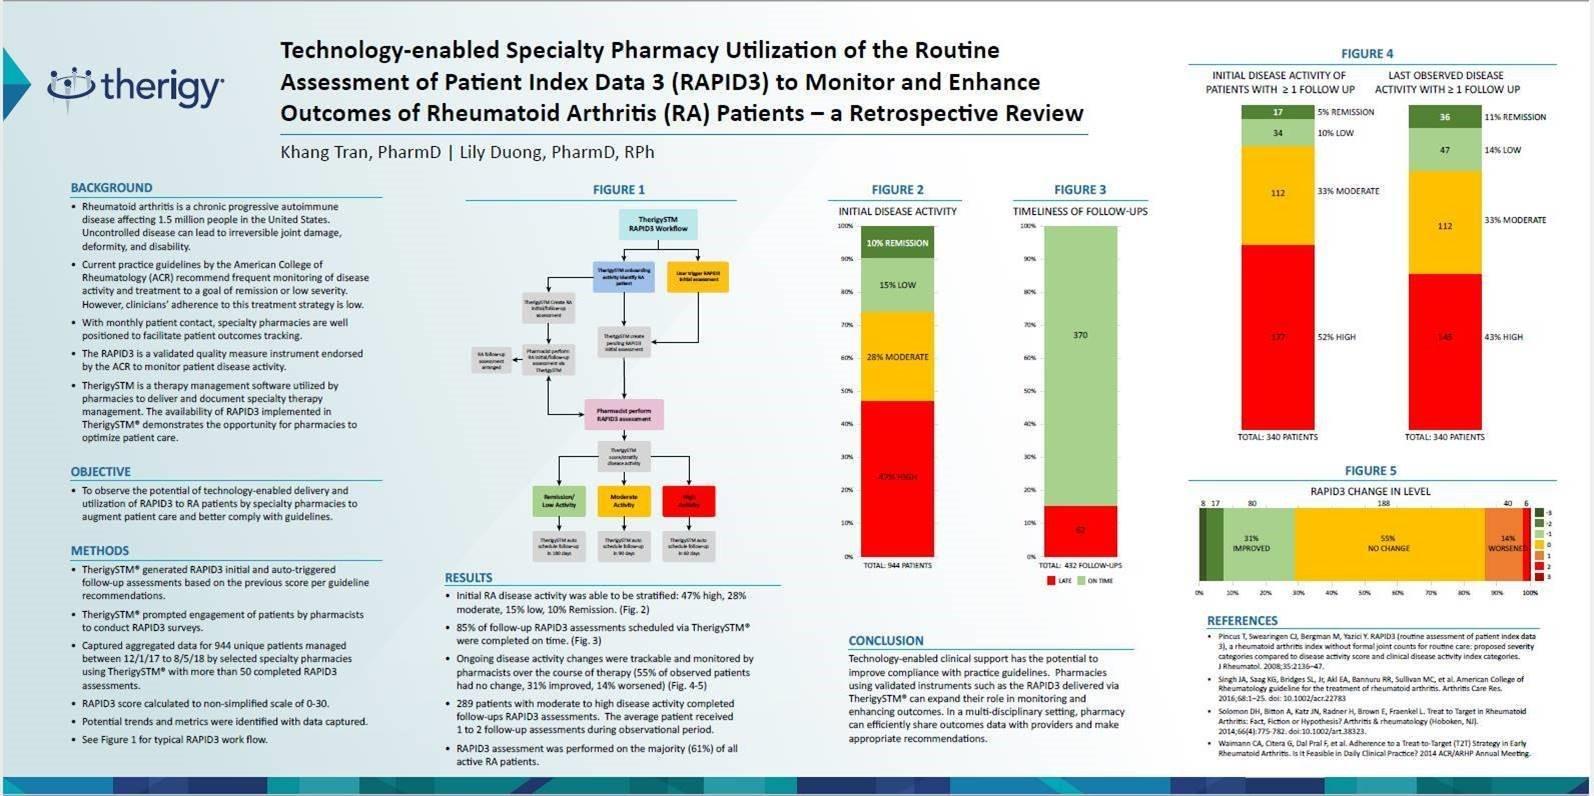 Rheumatoid Arthritis Specialty Patient Outcomes Poster Presentation  - NASP